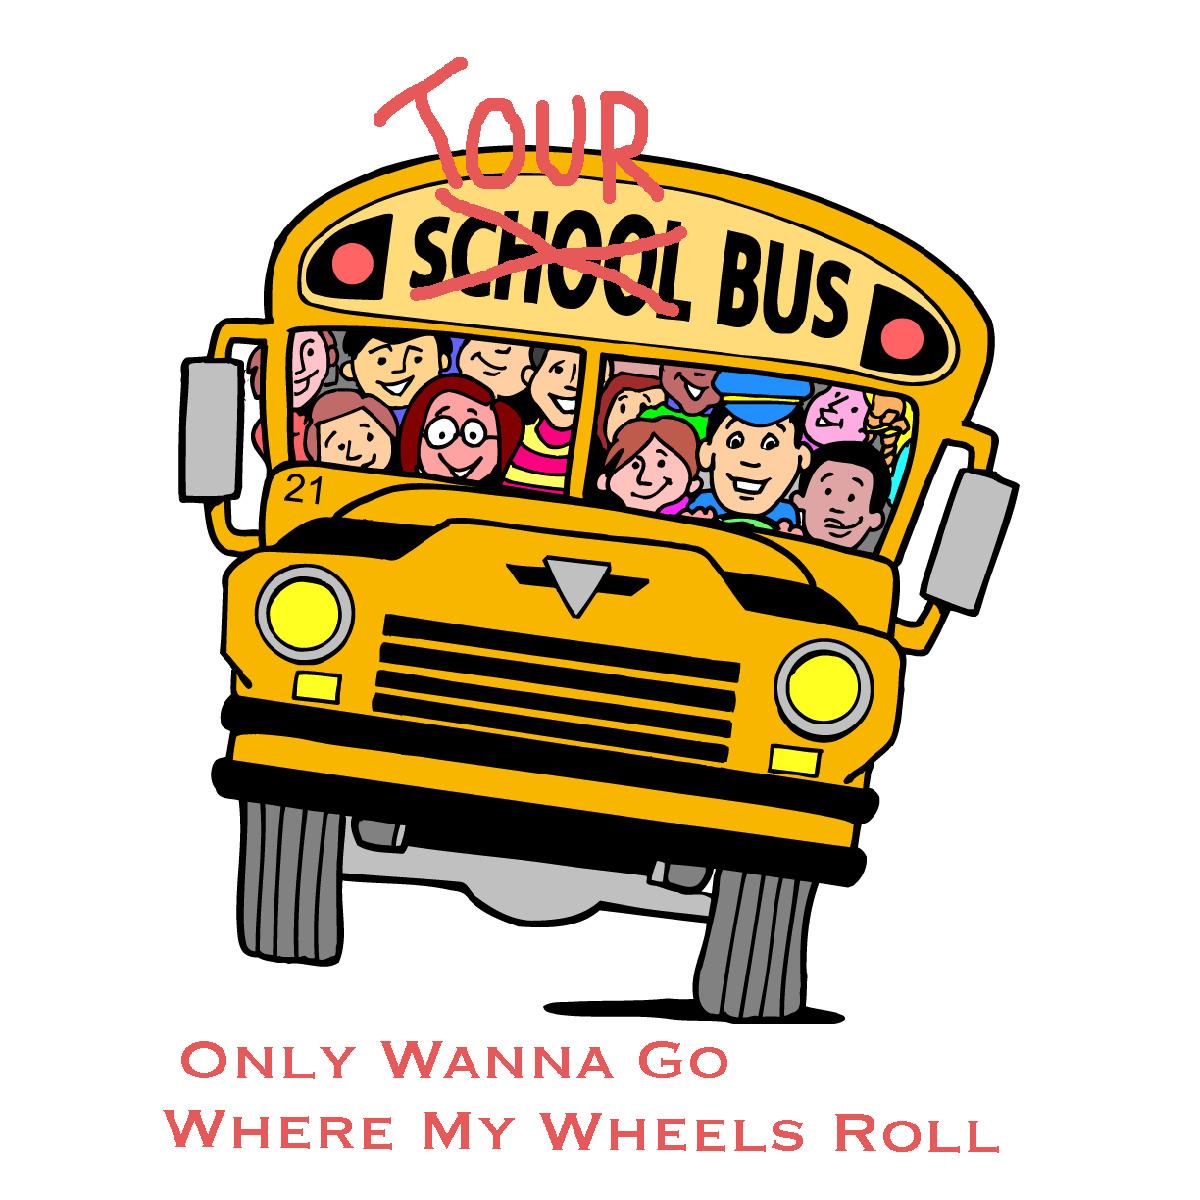 Tour Bus - Only Wanna Go Where My Wheels Roll art